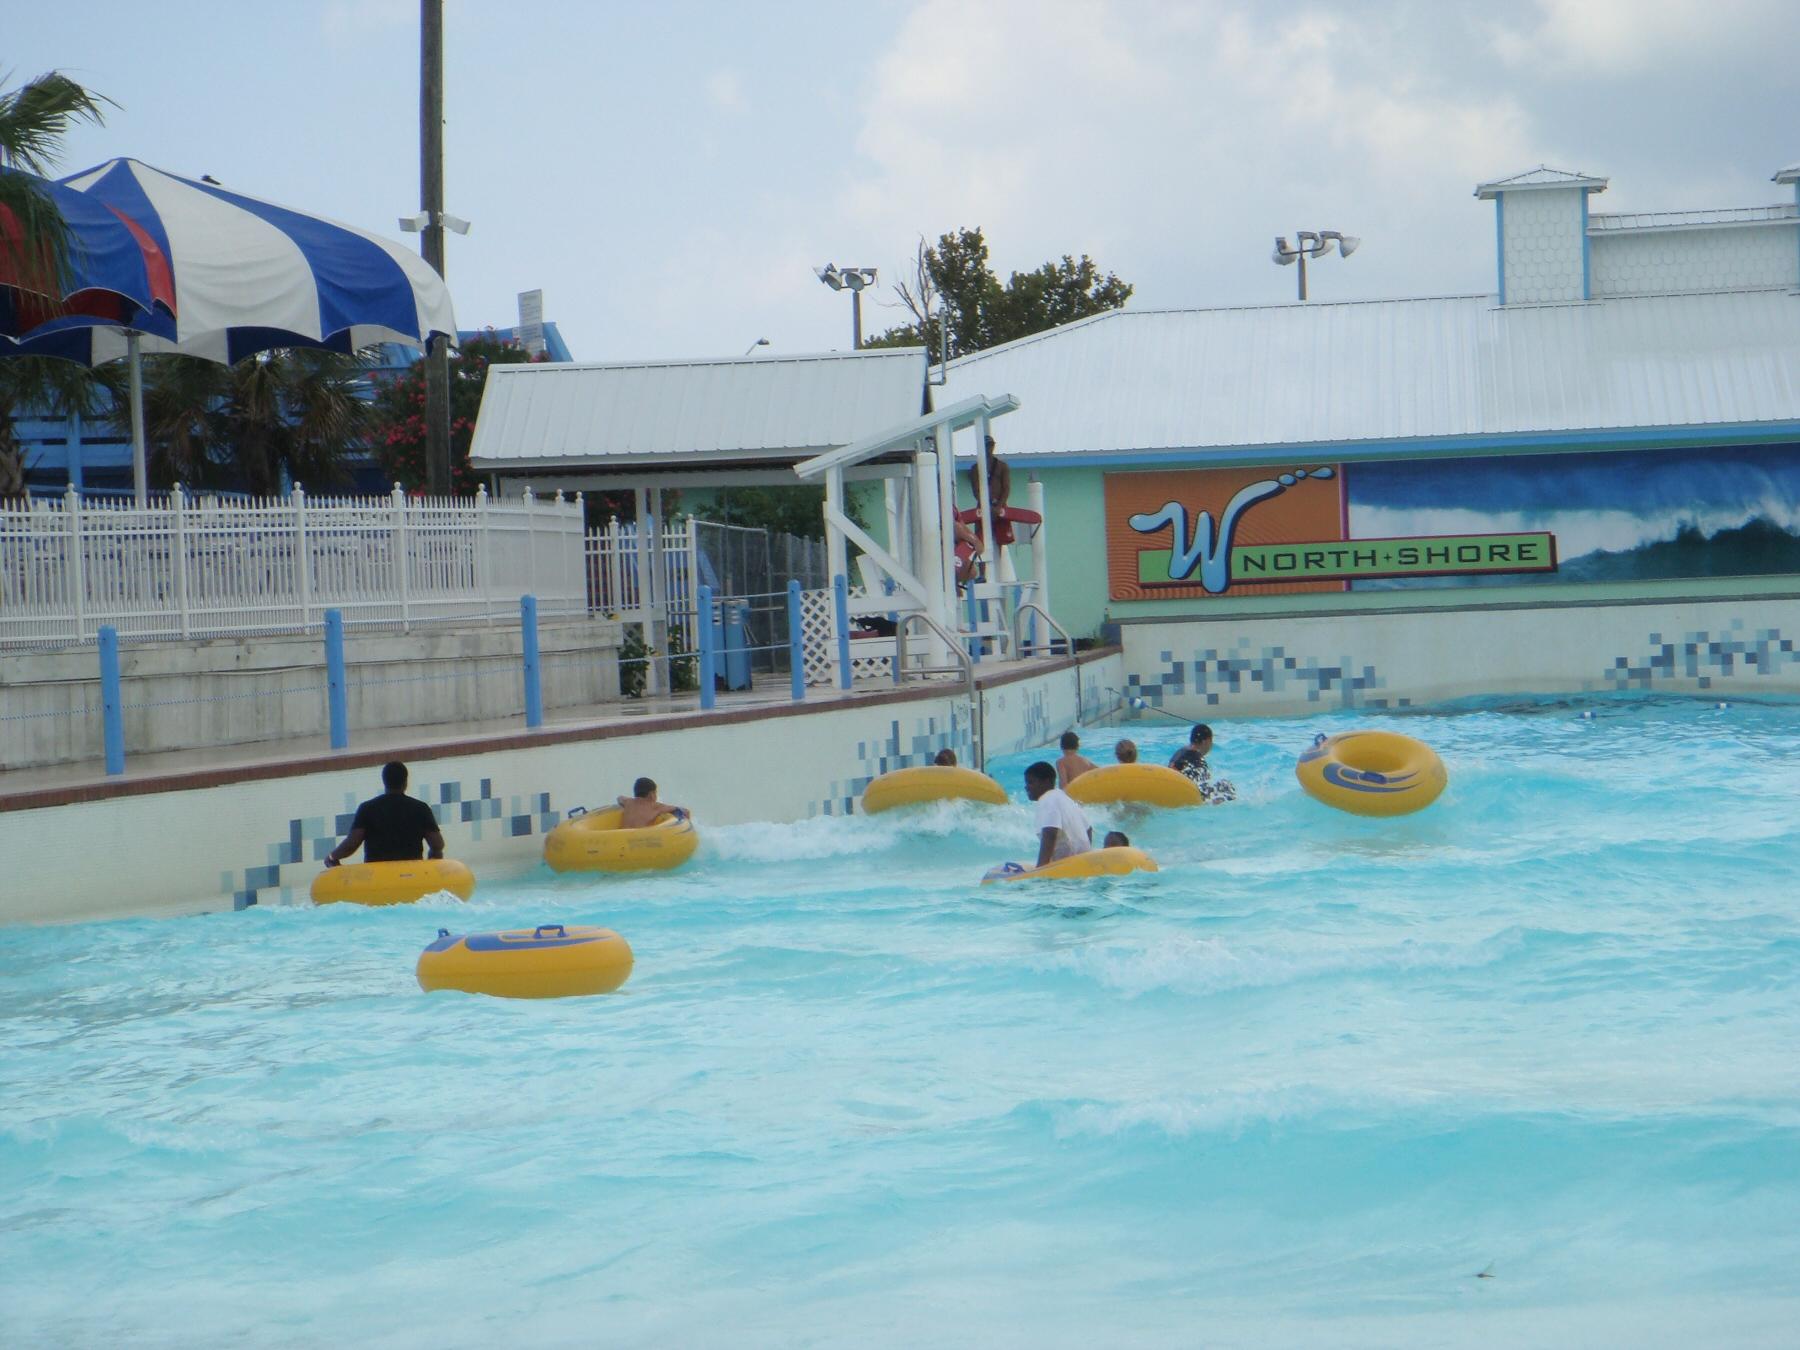 people in wave pool